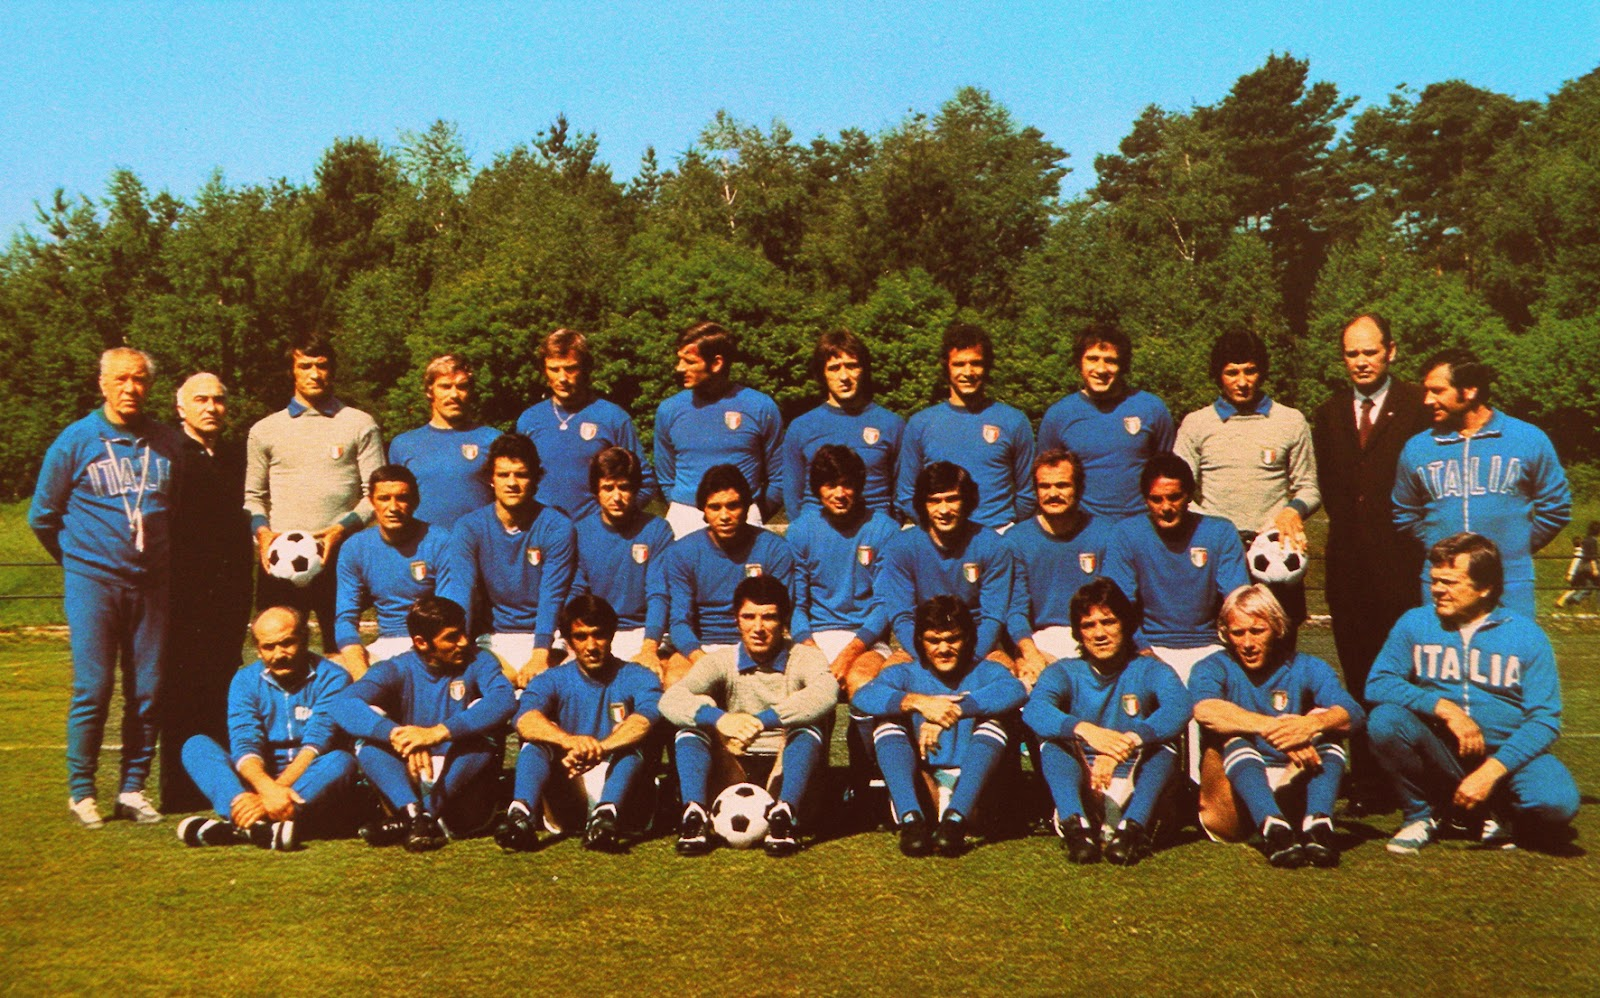 Italie 1974 coupe du monde the vintage football club - Italie foot coupe du monde ...